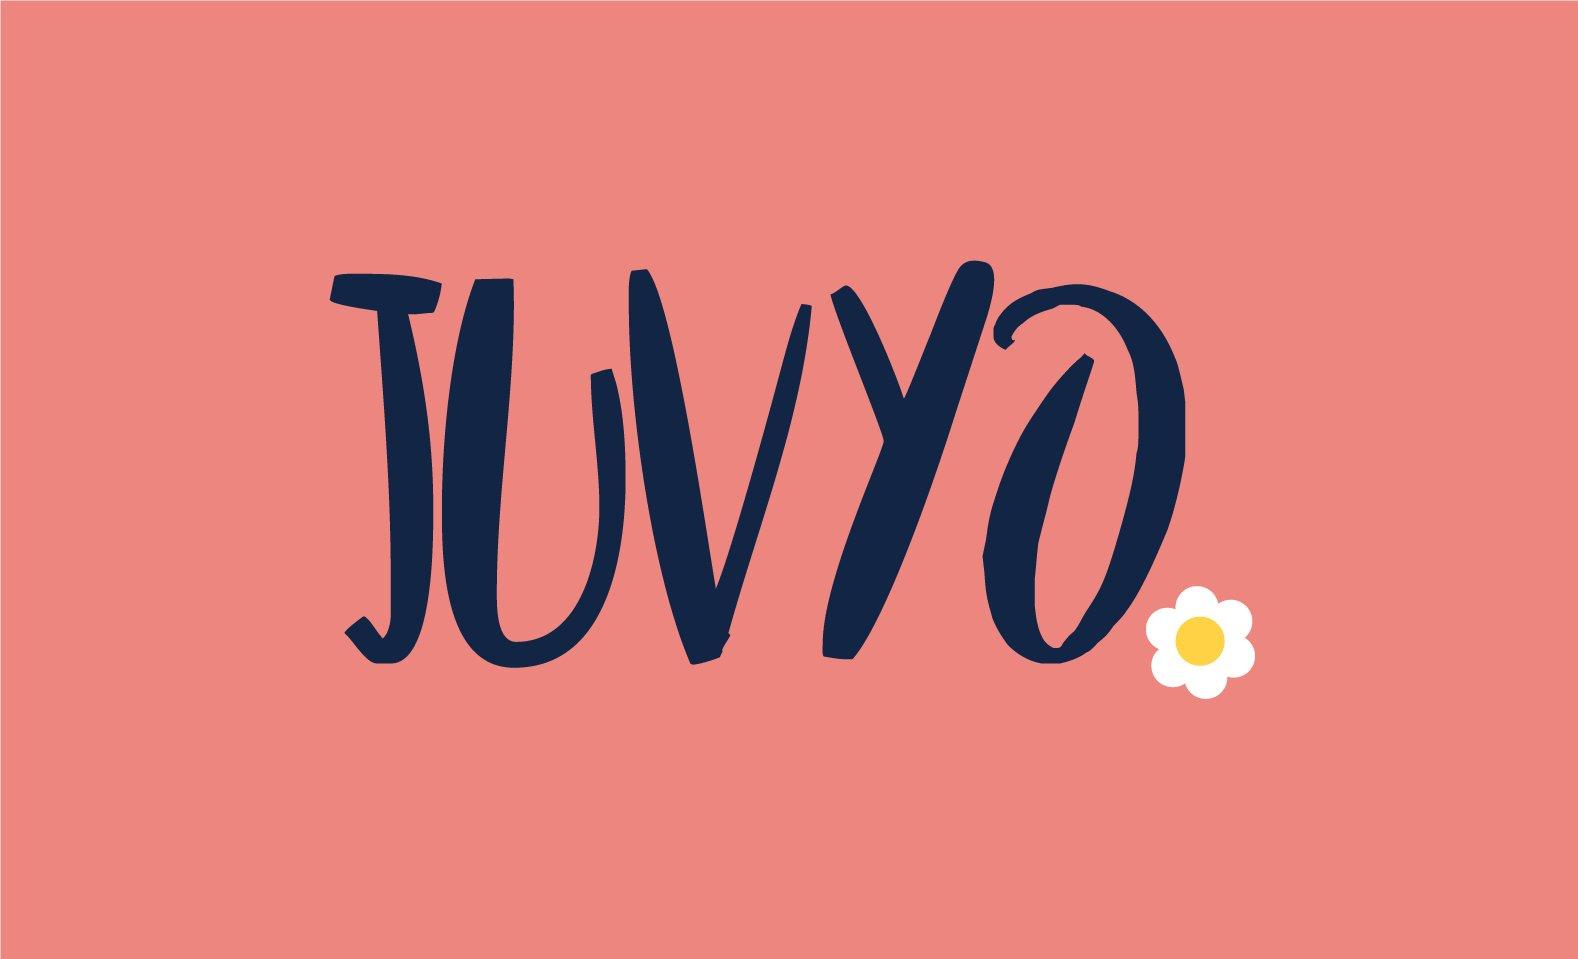 Juvyo.com